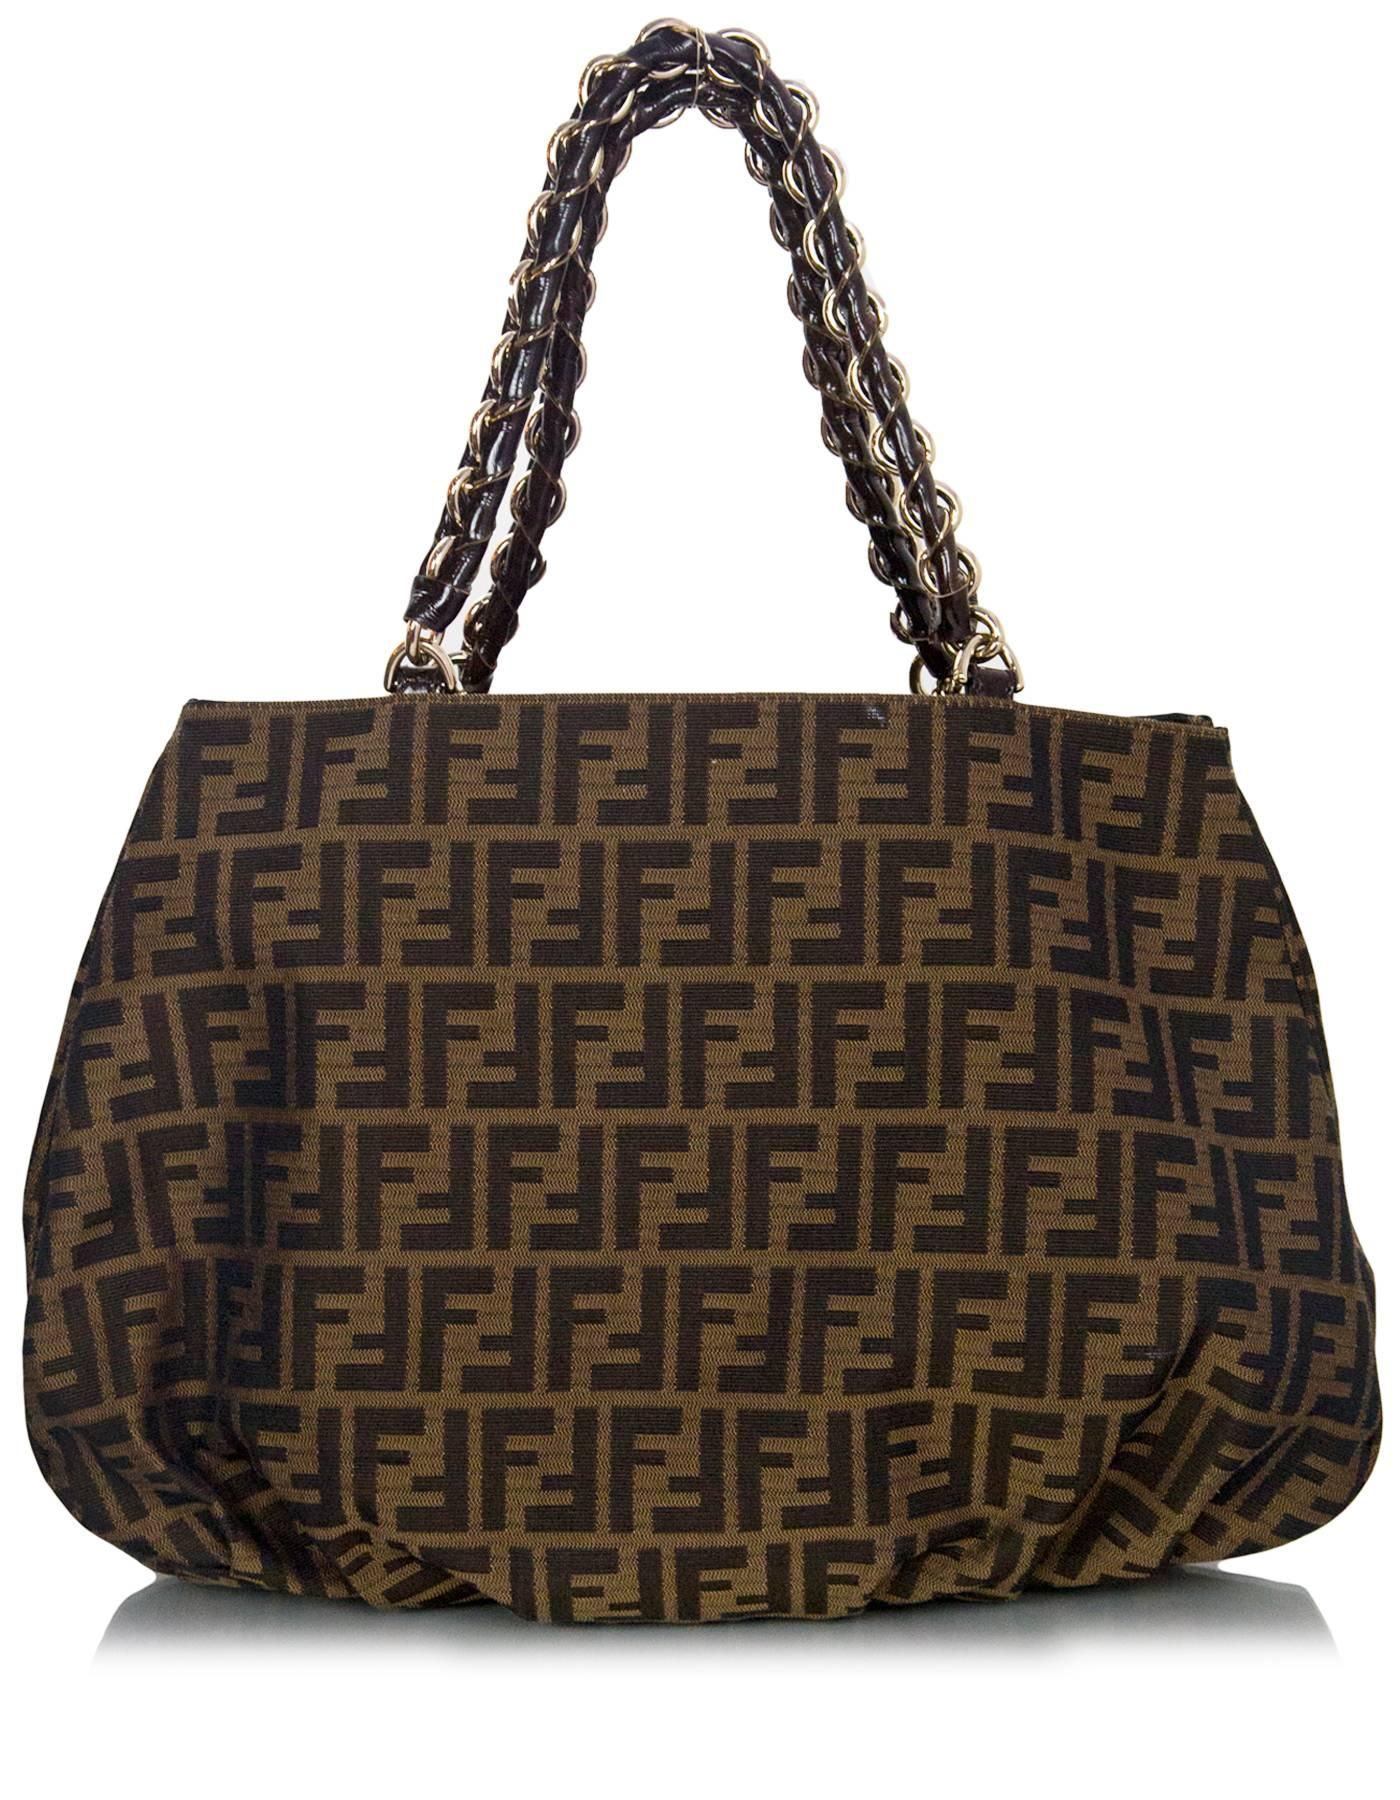 5b2f2b2fb809 czech black fendi tobacco brown zucca borsa mia tote bag for sale cbac9  28ff3